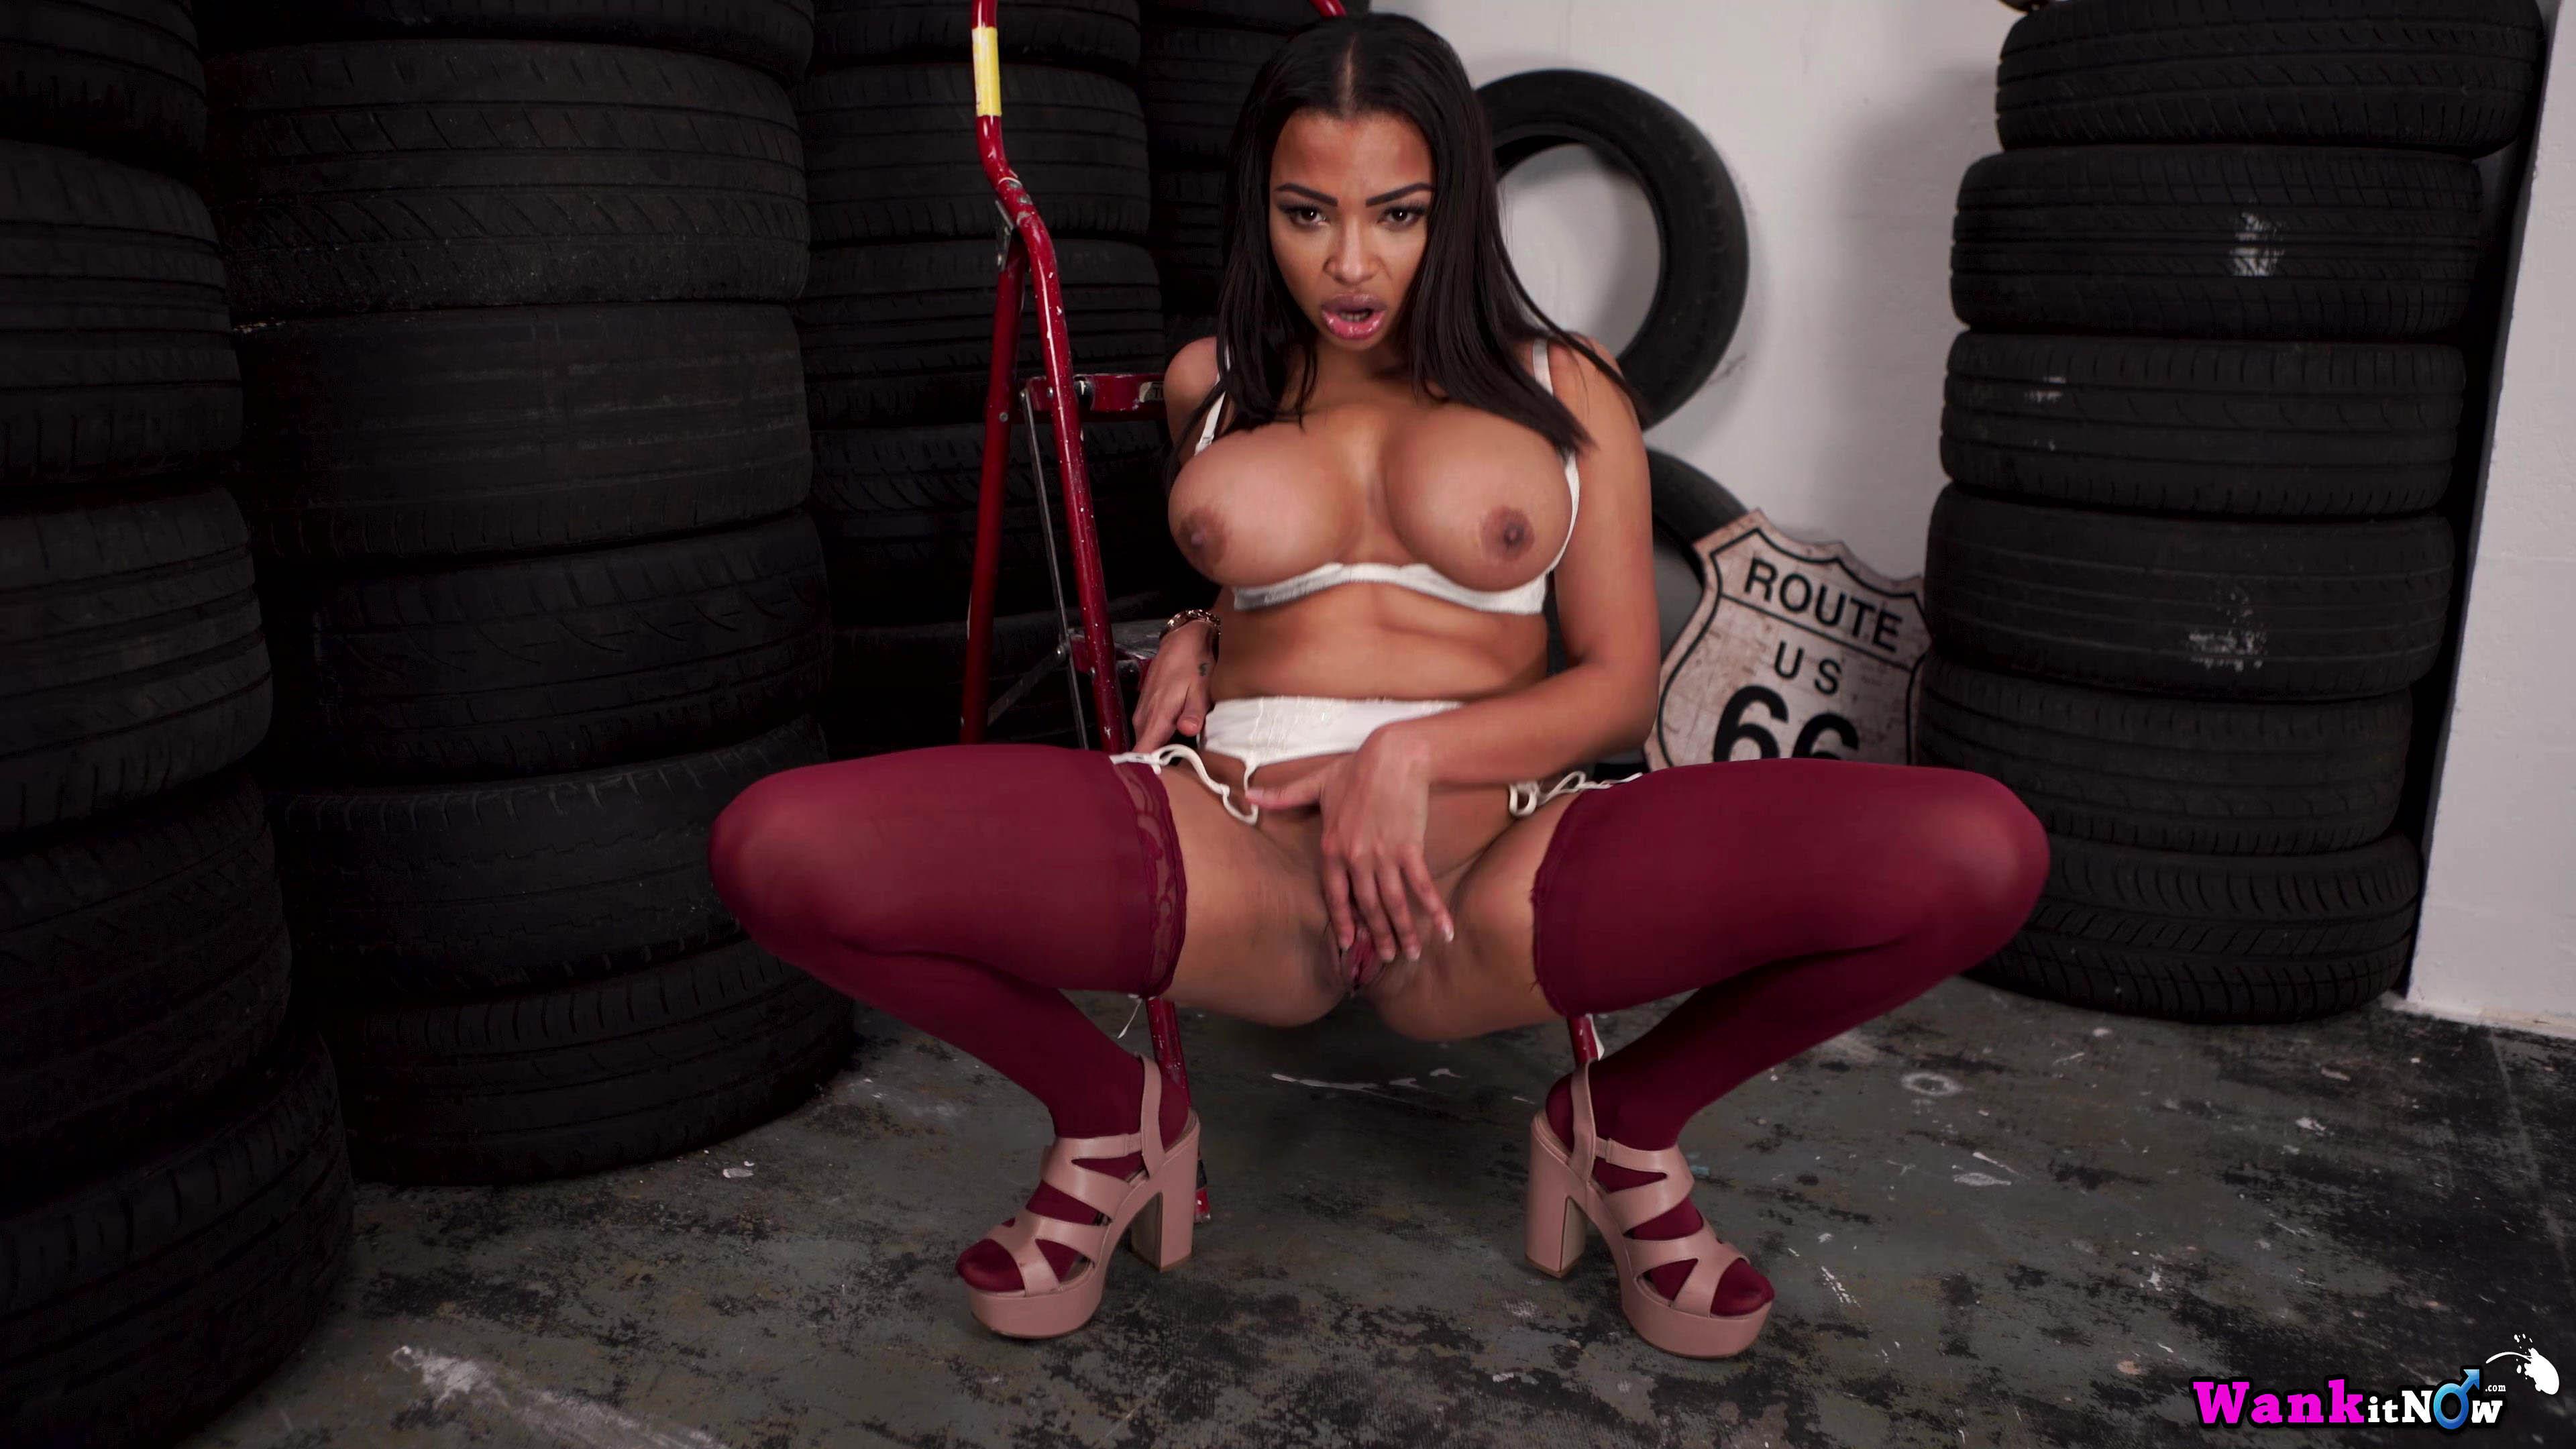 Ruby summers sex and next level porn xxx step aunt seduction